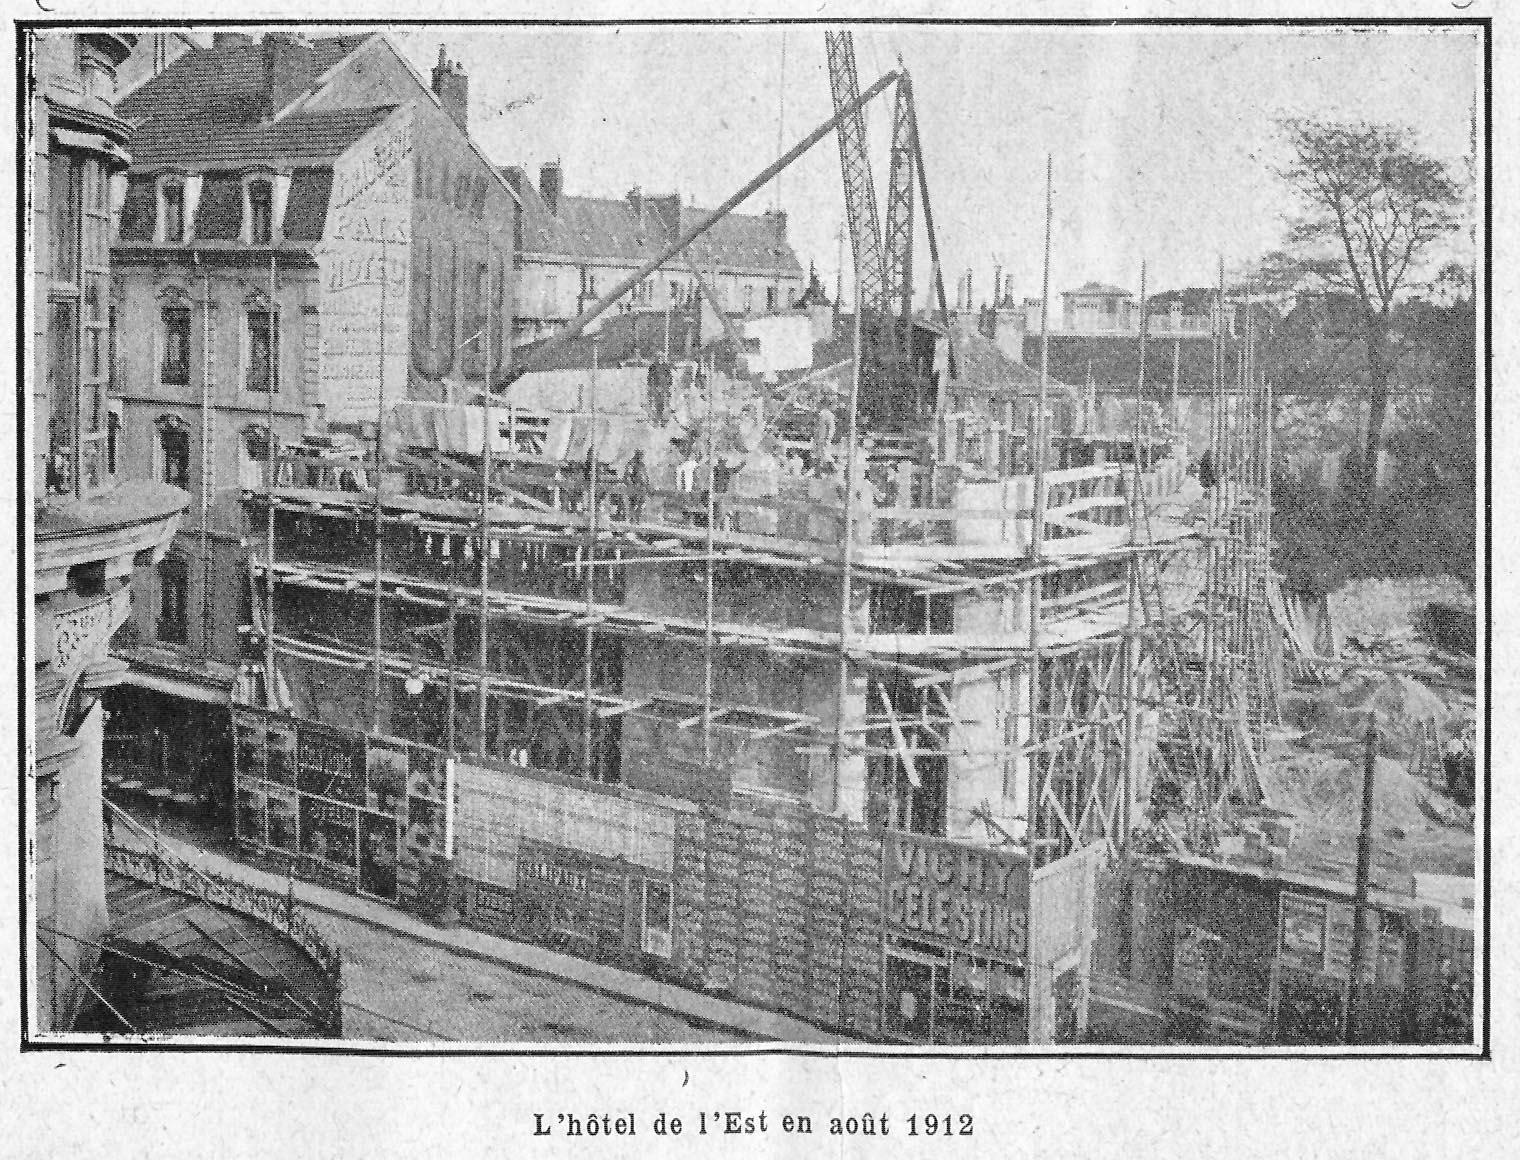 Contenu du L'hôtel de l'Est en août 1912